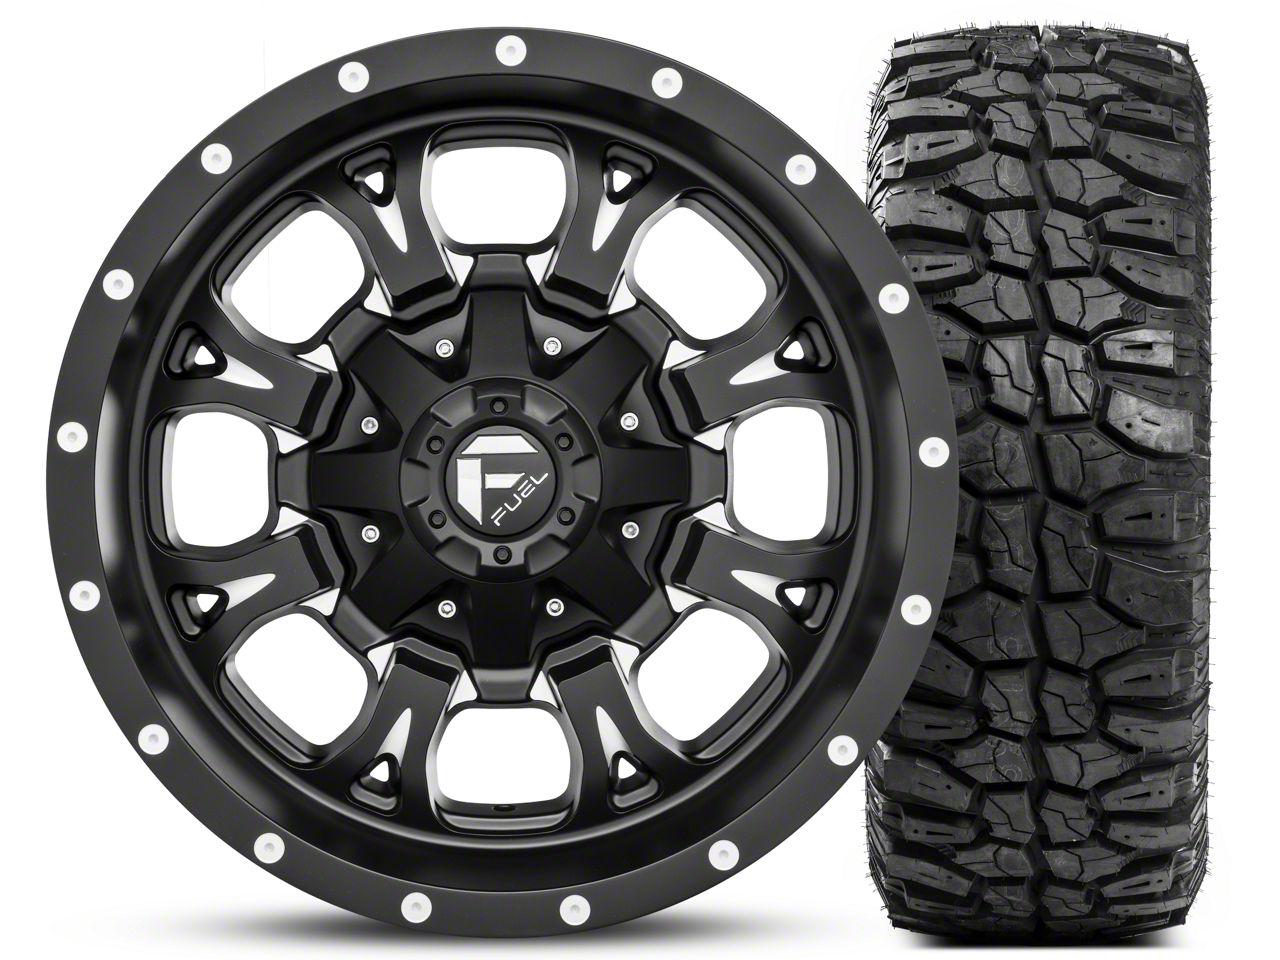 Fuel Wheels Krank Black Milled 17x9 and Mudclaw M/T LT265/70R17 Kit (07-18 Jeep Wrangler JK; 2018 Jeep Wrangler JL)